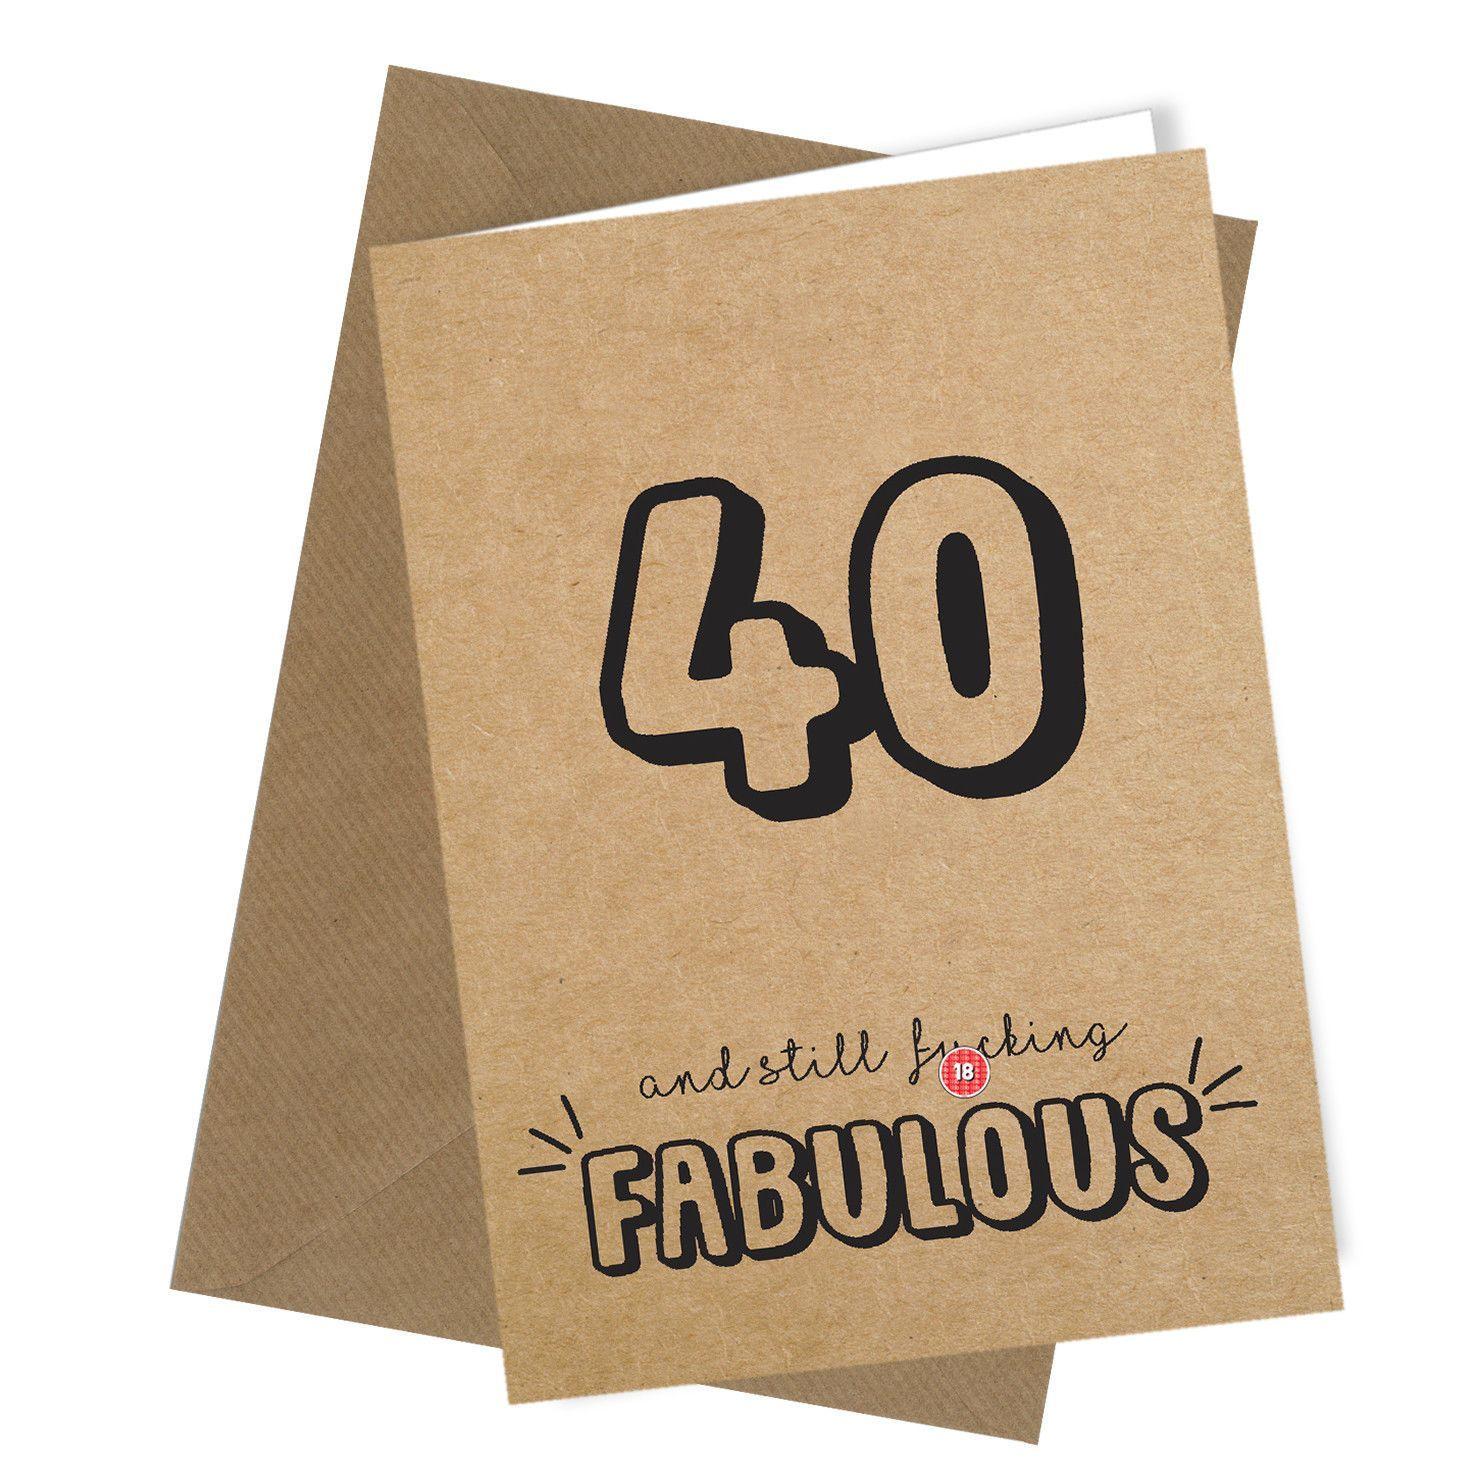 #145 Fabulous 40